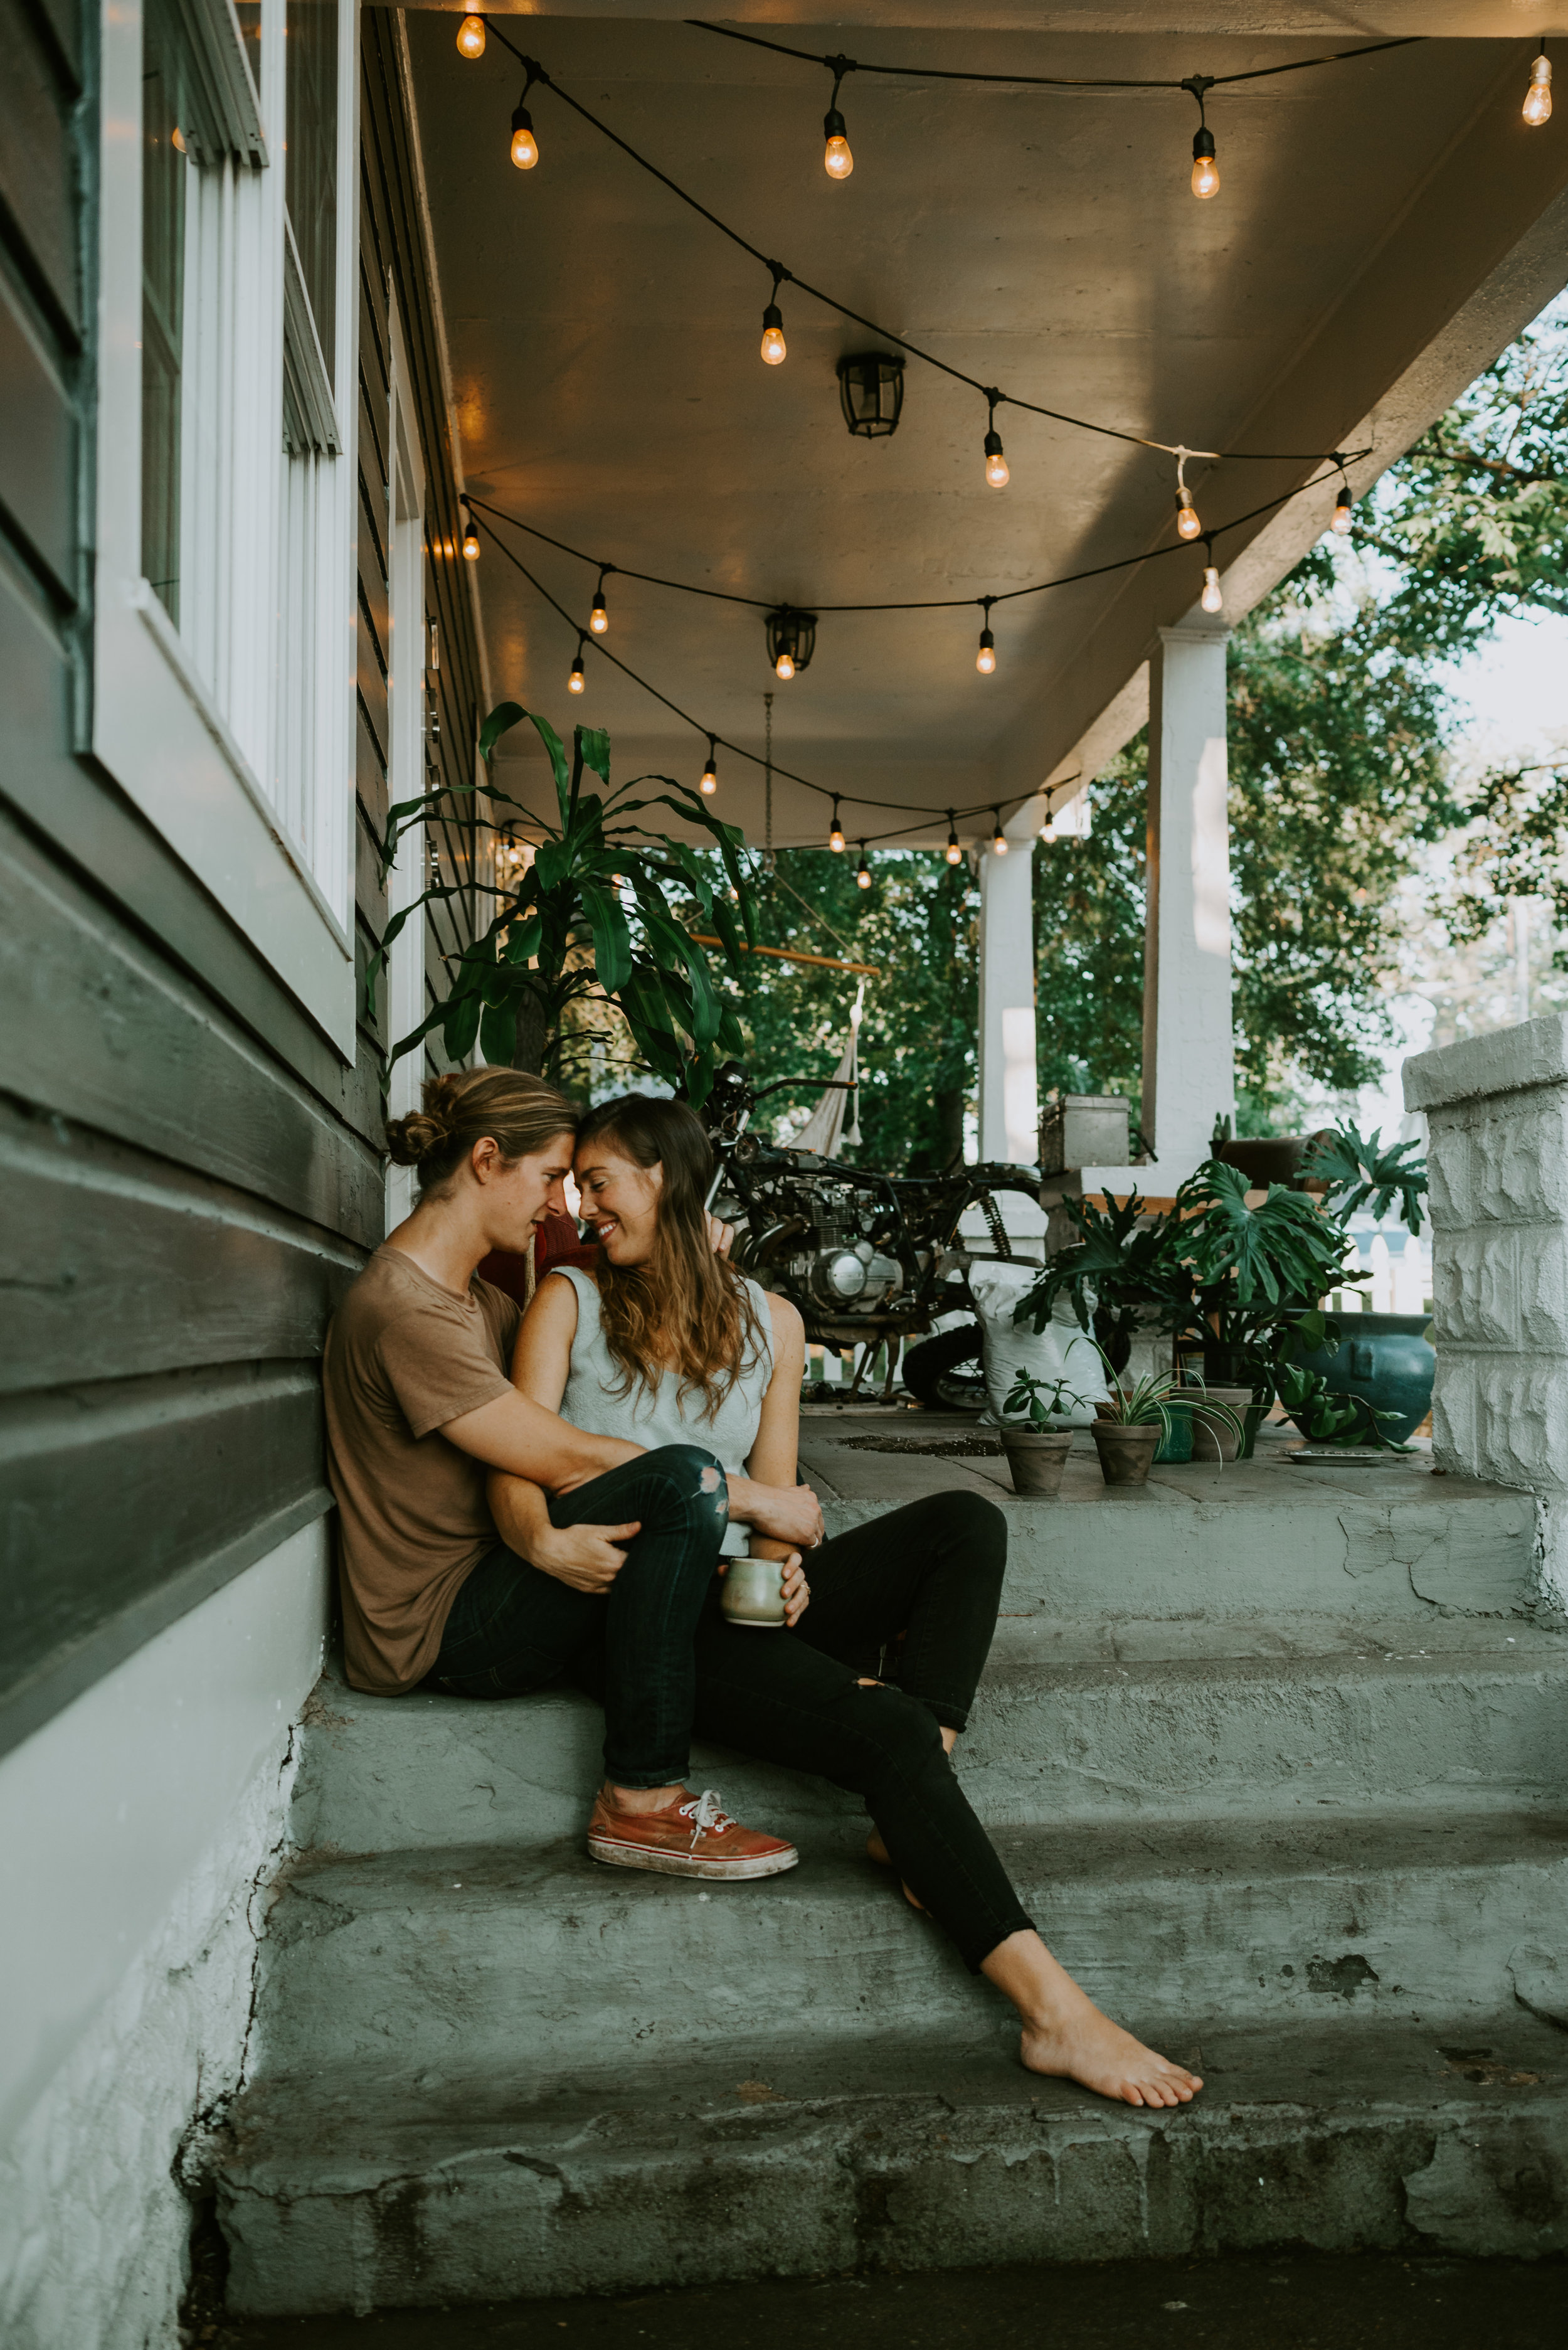 WonderlyCreative_Couples_7.9.18_Cameron&Alexis_-119.jpg